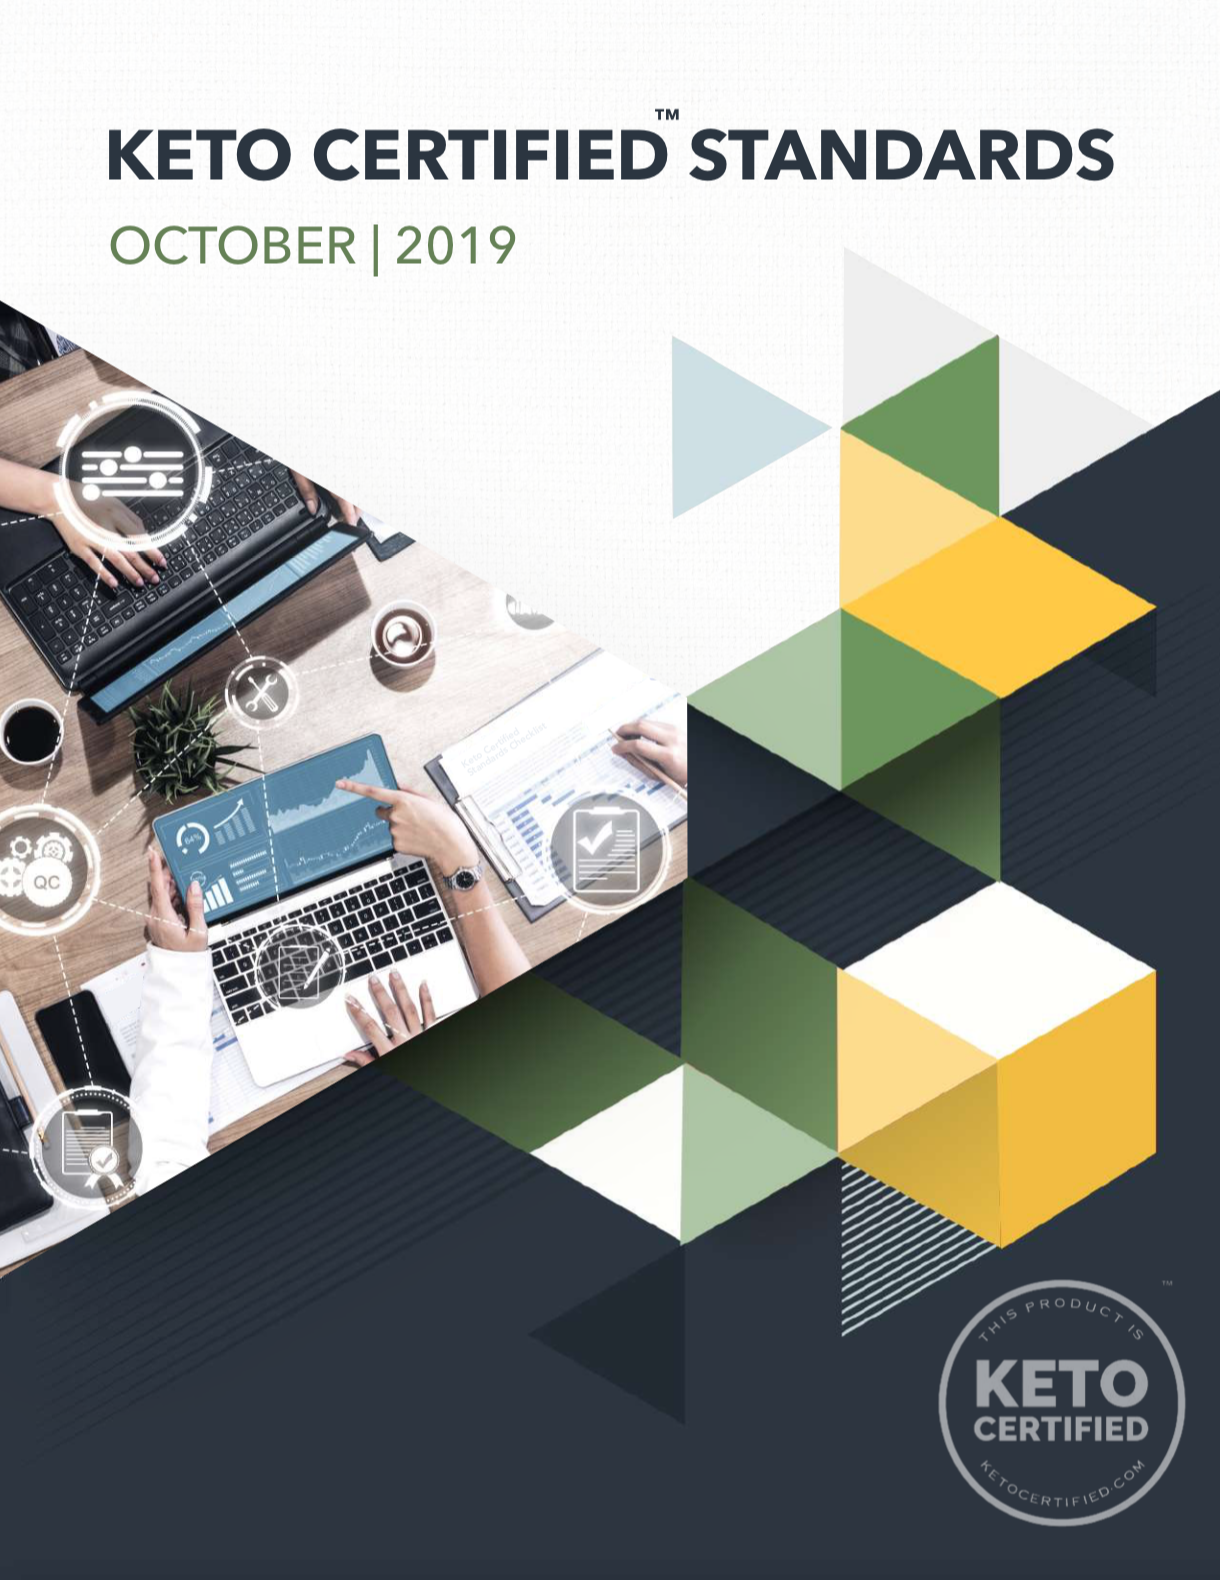 Keto Certified Standards October 2019